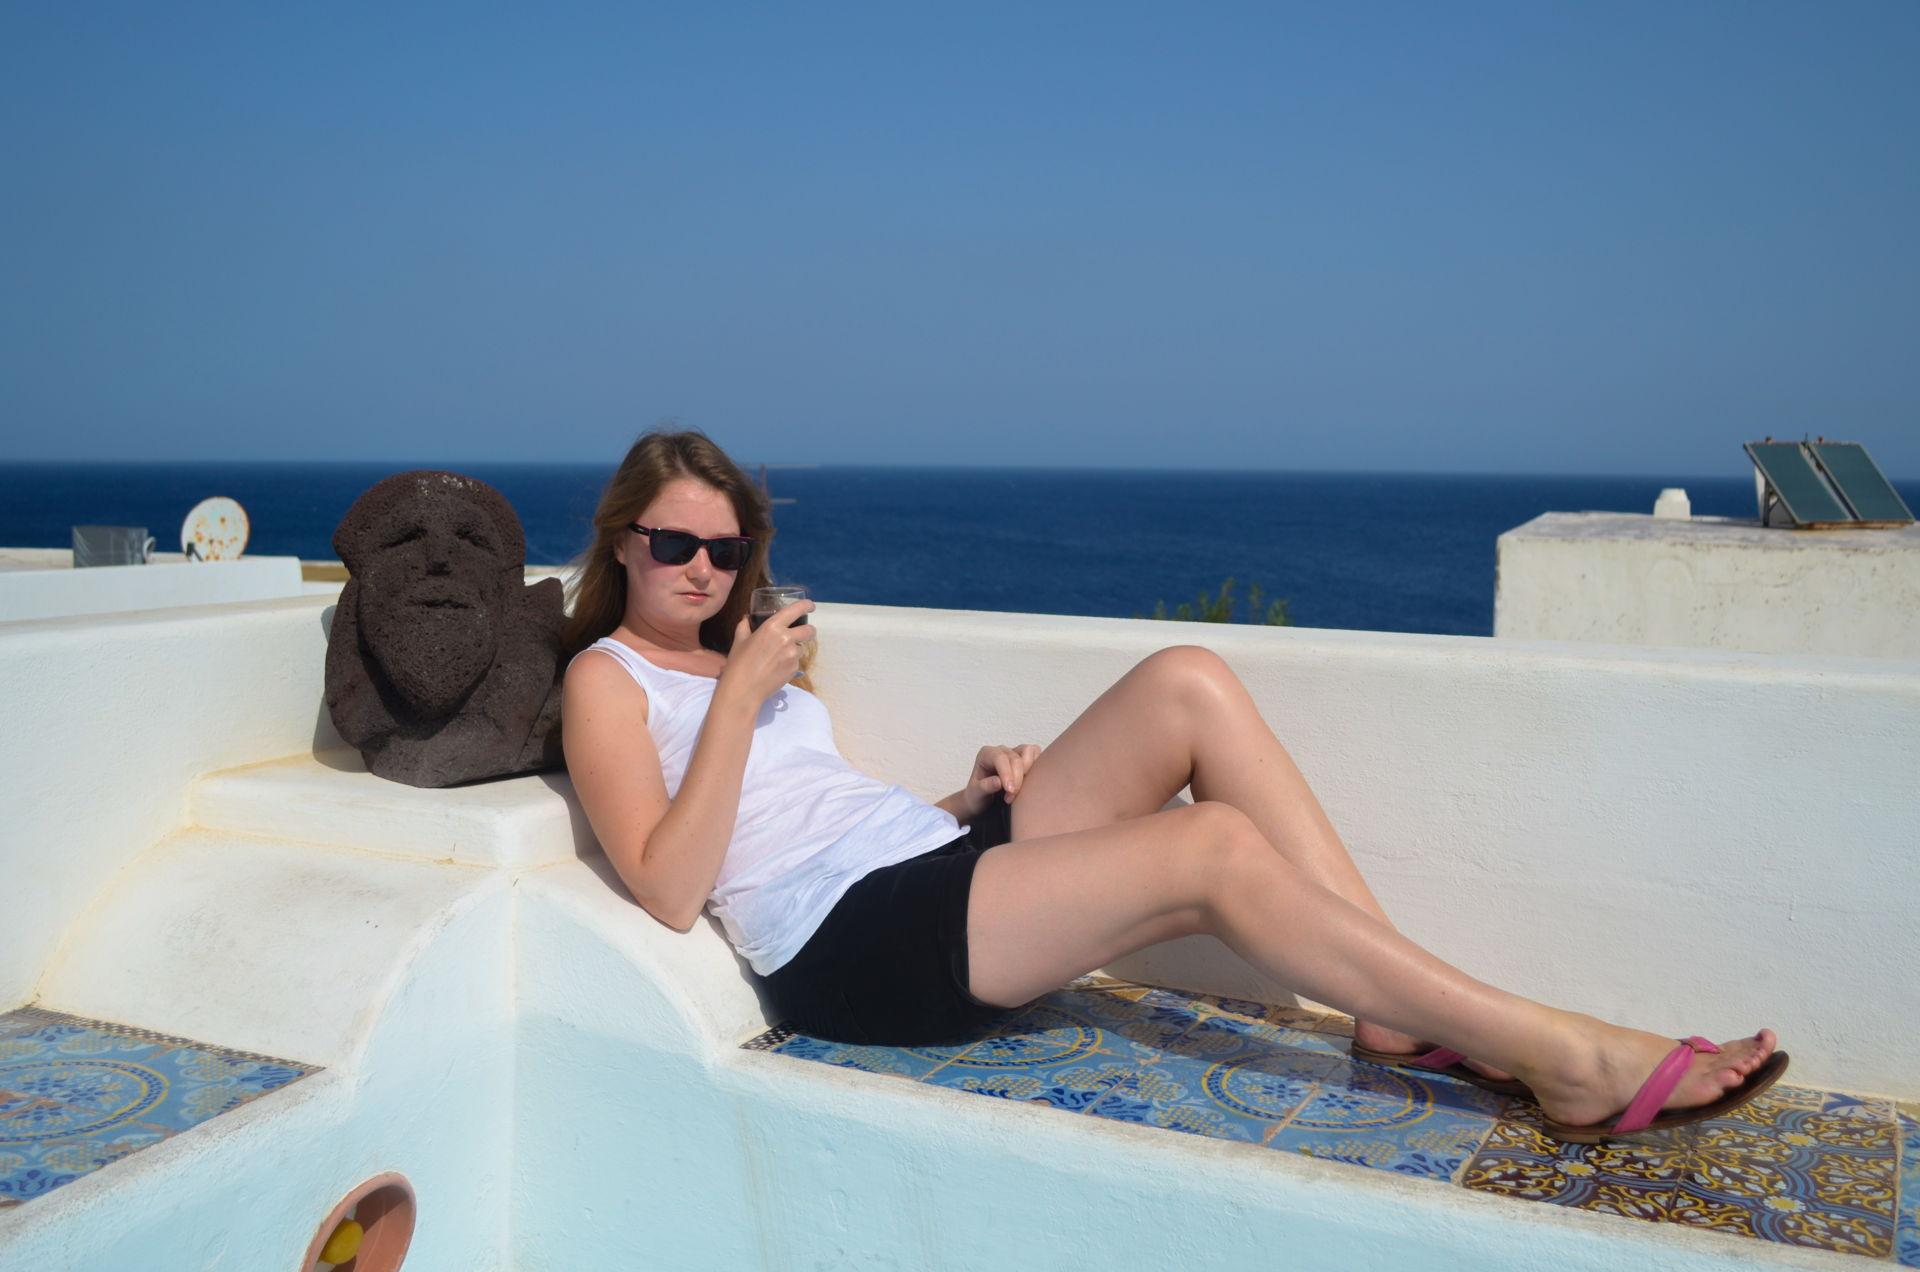 stromboli, stromboli beautiful girl, stromboli volcano, stromboli where to stay, best place to stay in stromboli, aeolian islands travel guide